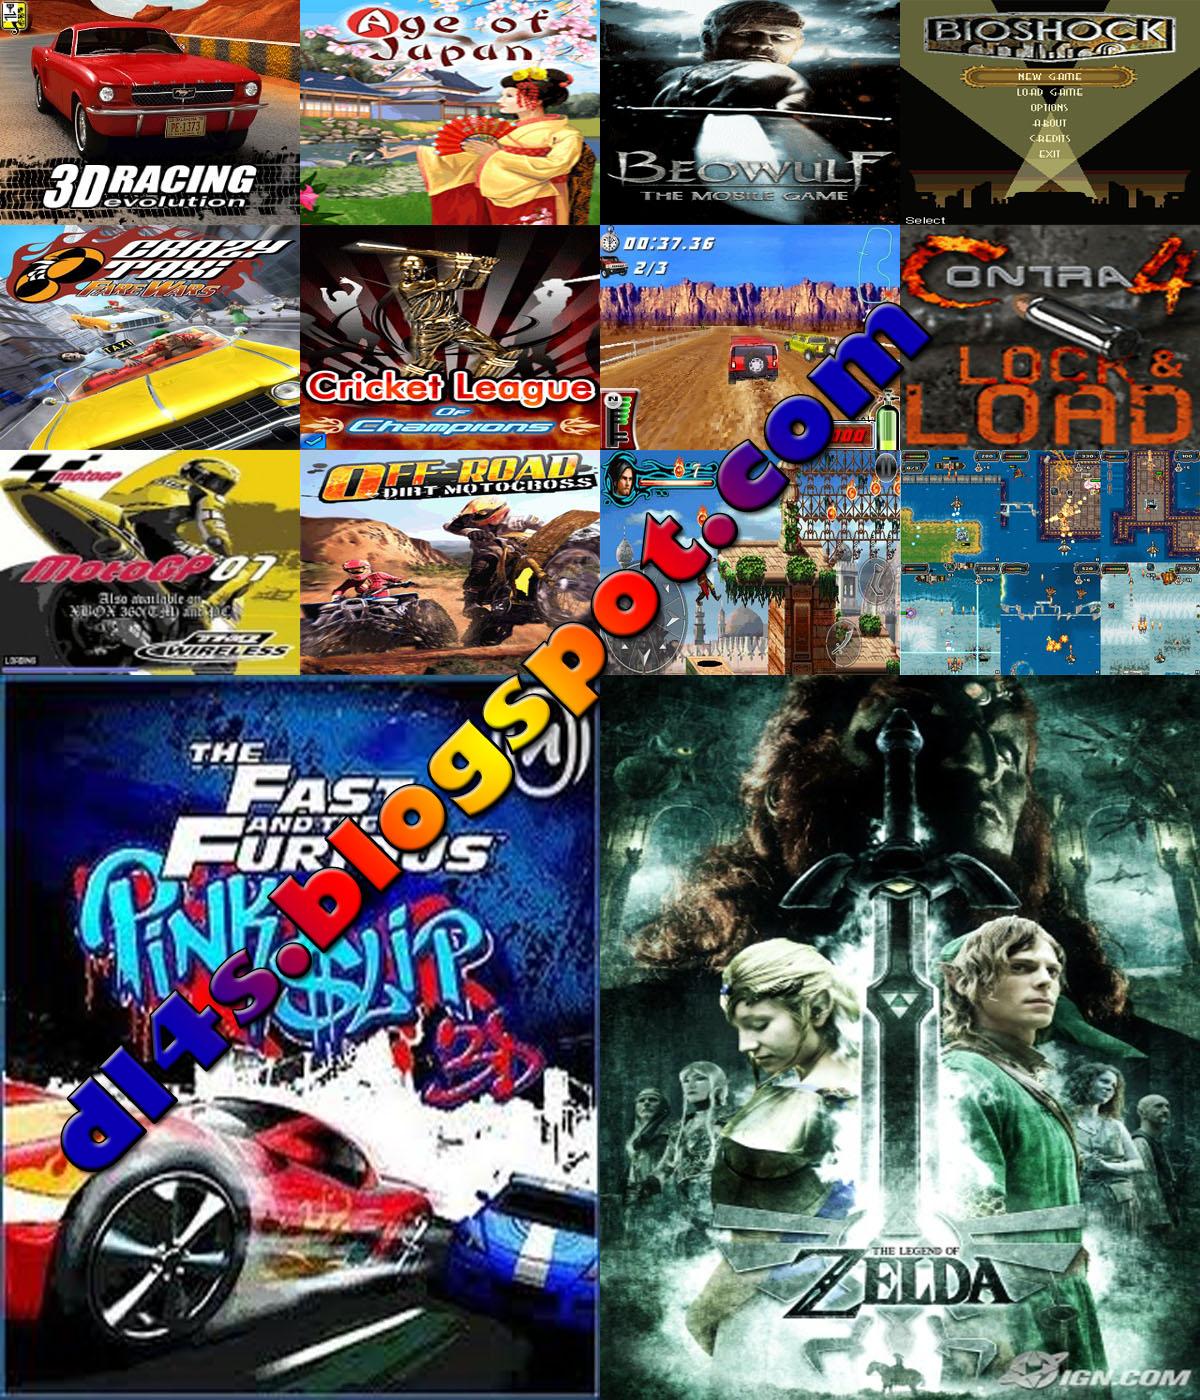 Symbian hd games download for s60v3 - www byeqsxnkggo ml